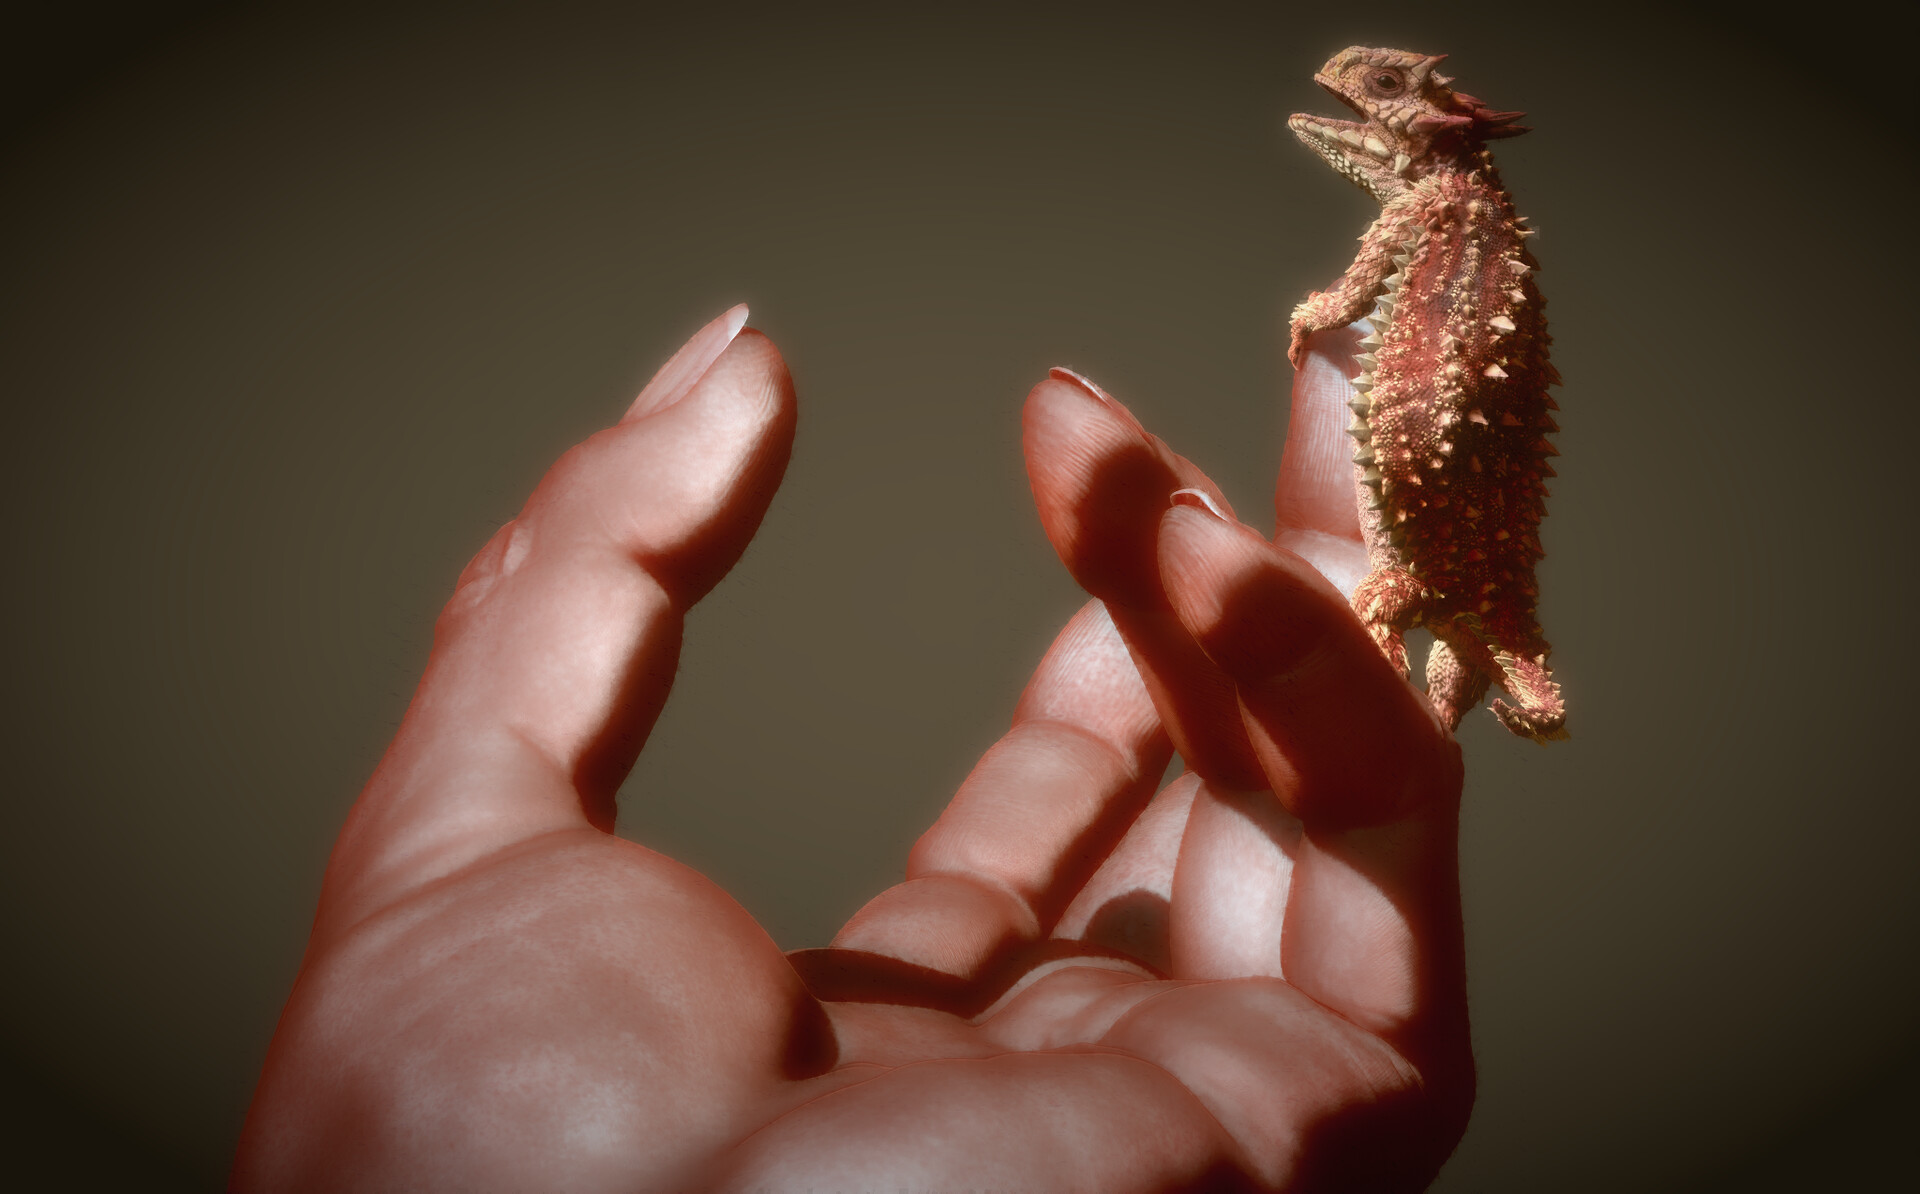 Eric keller keller lizard 004